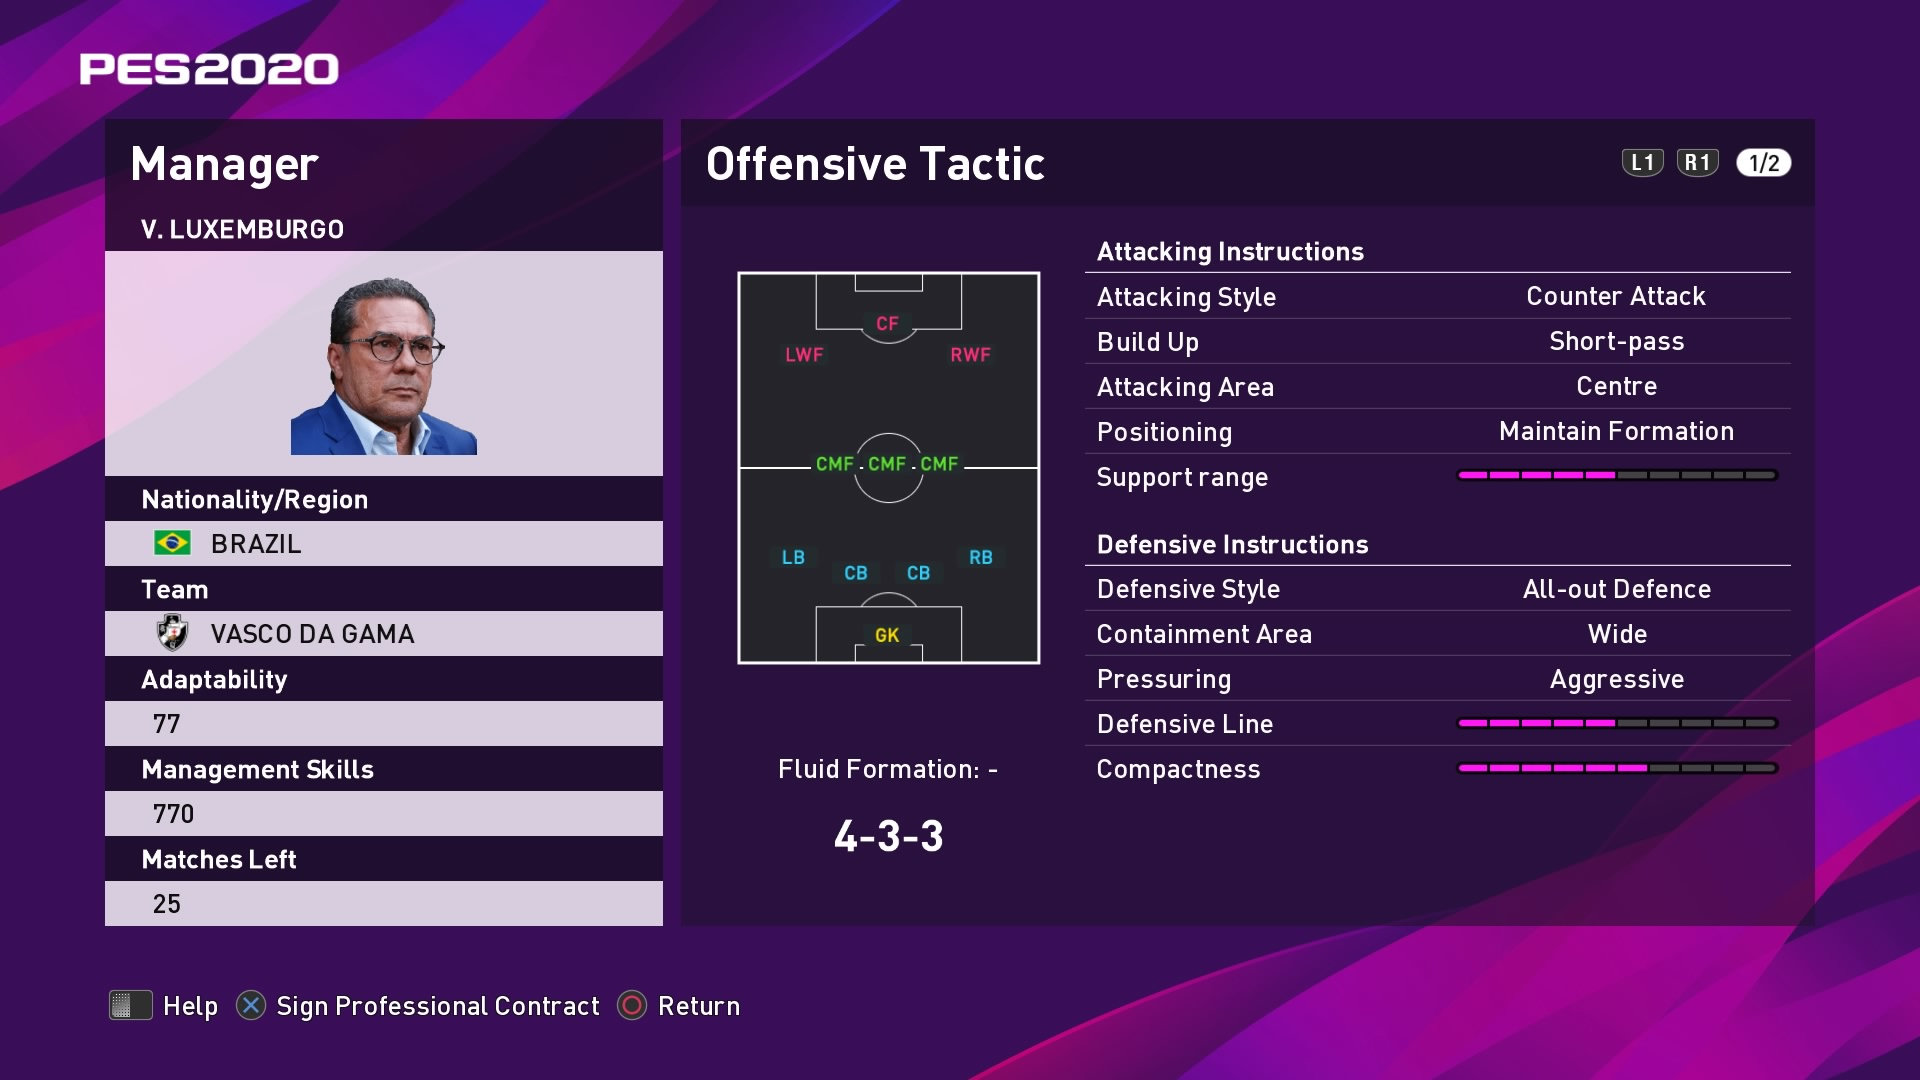 V. Luxemburgo (Vanderlei Luxemburgo) Offensive Tactic in PES 2020 myClub